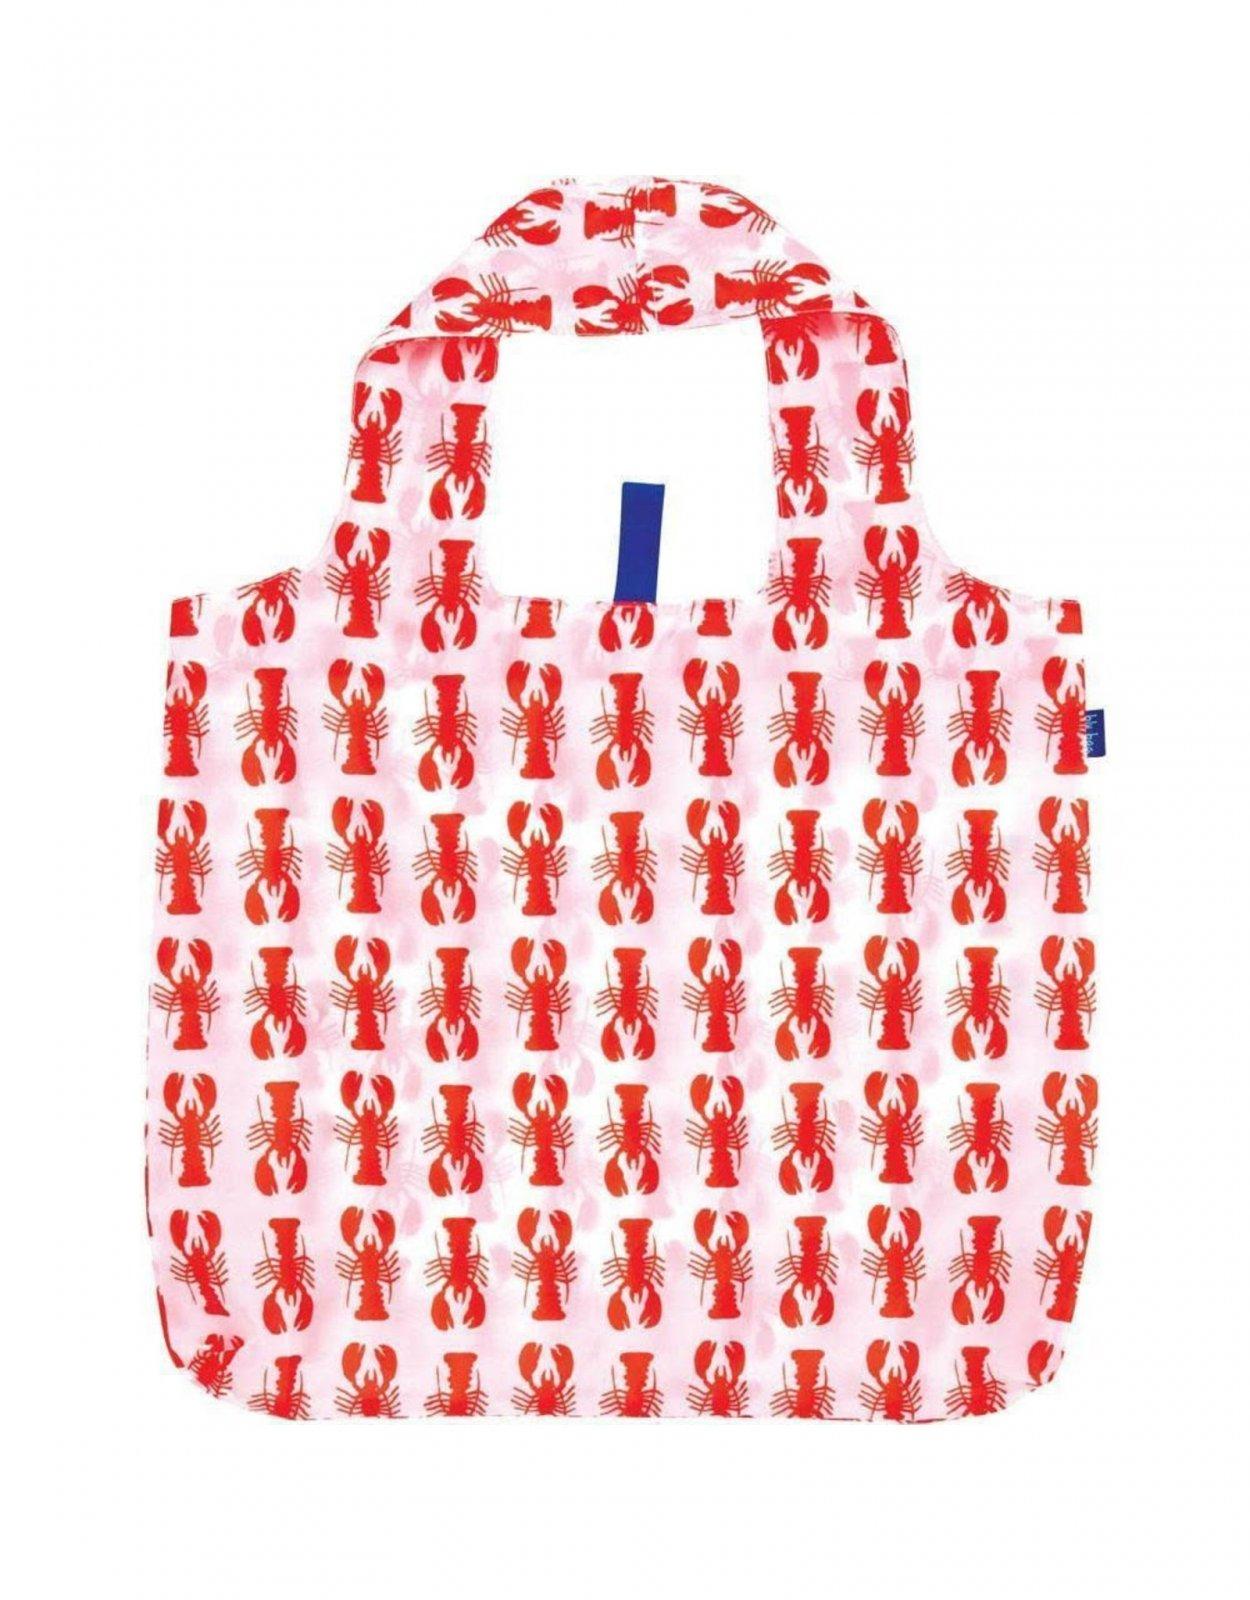 BluBag Reusable Shopping Bag - Lobby Lobster